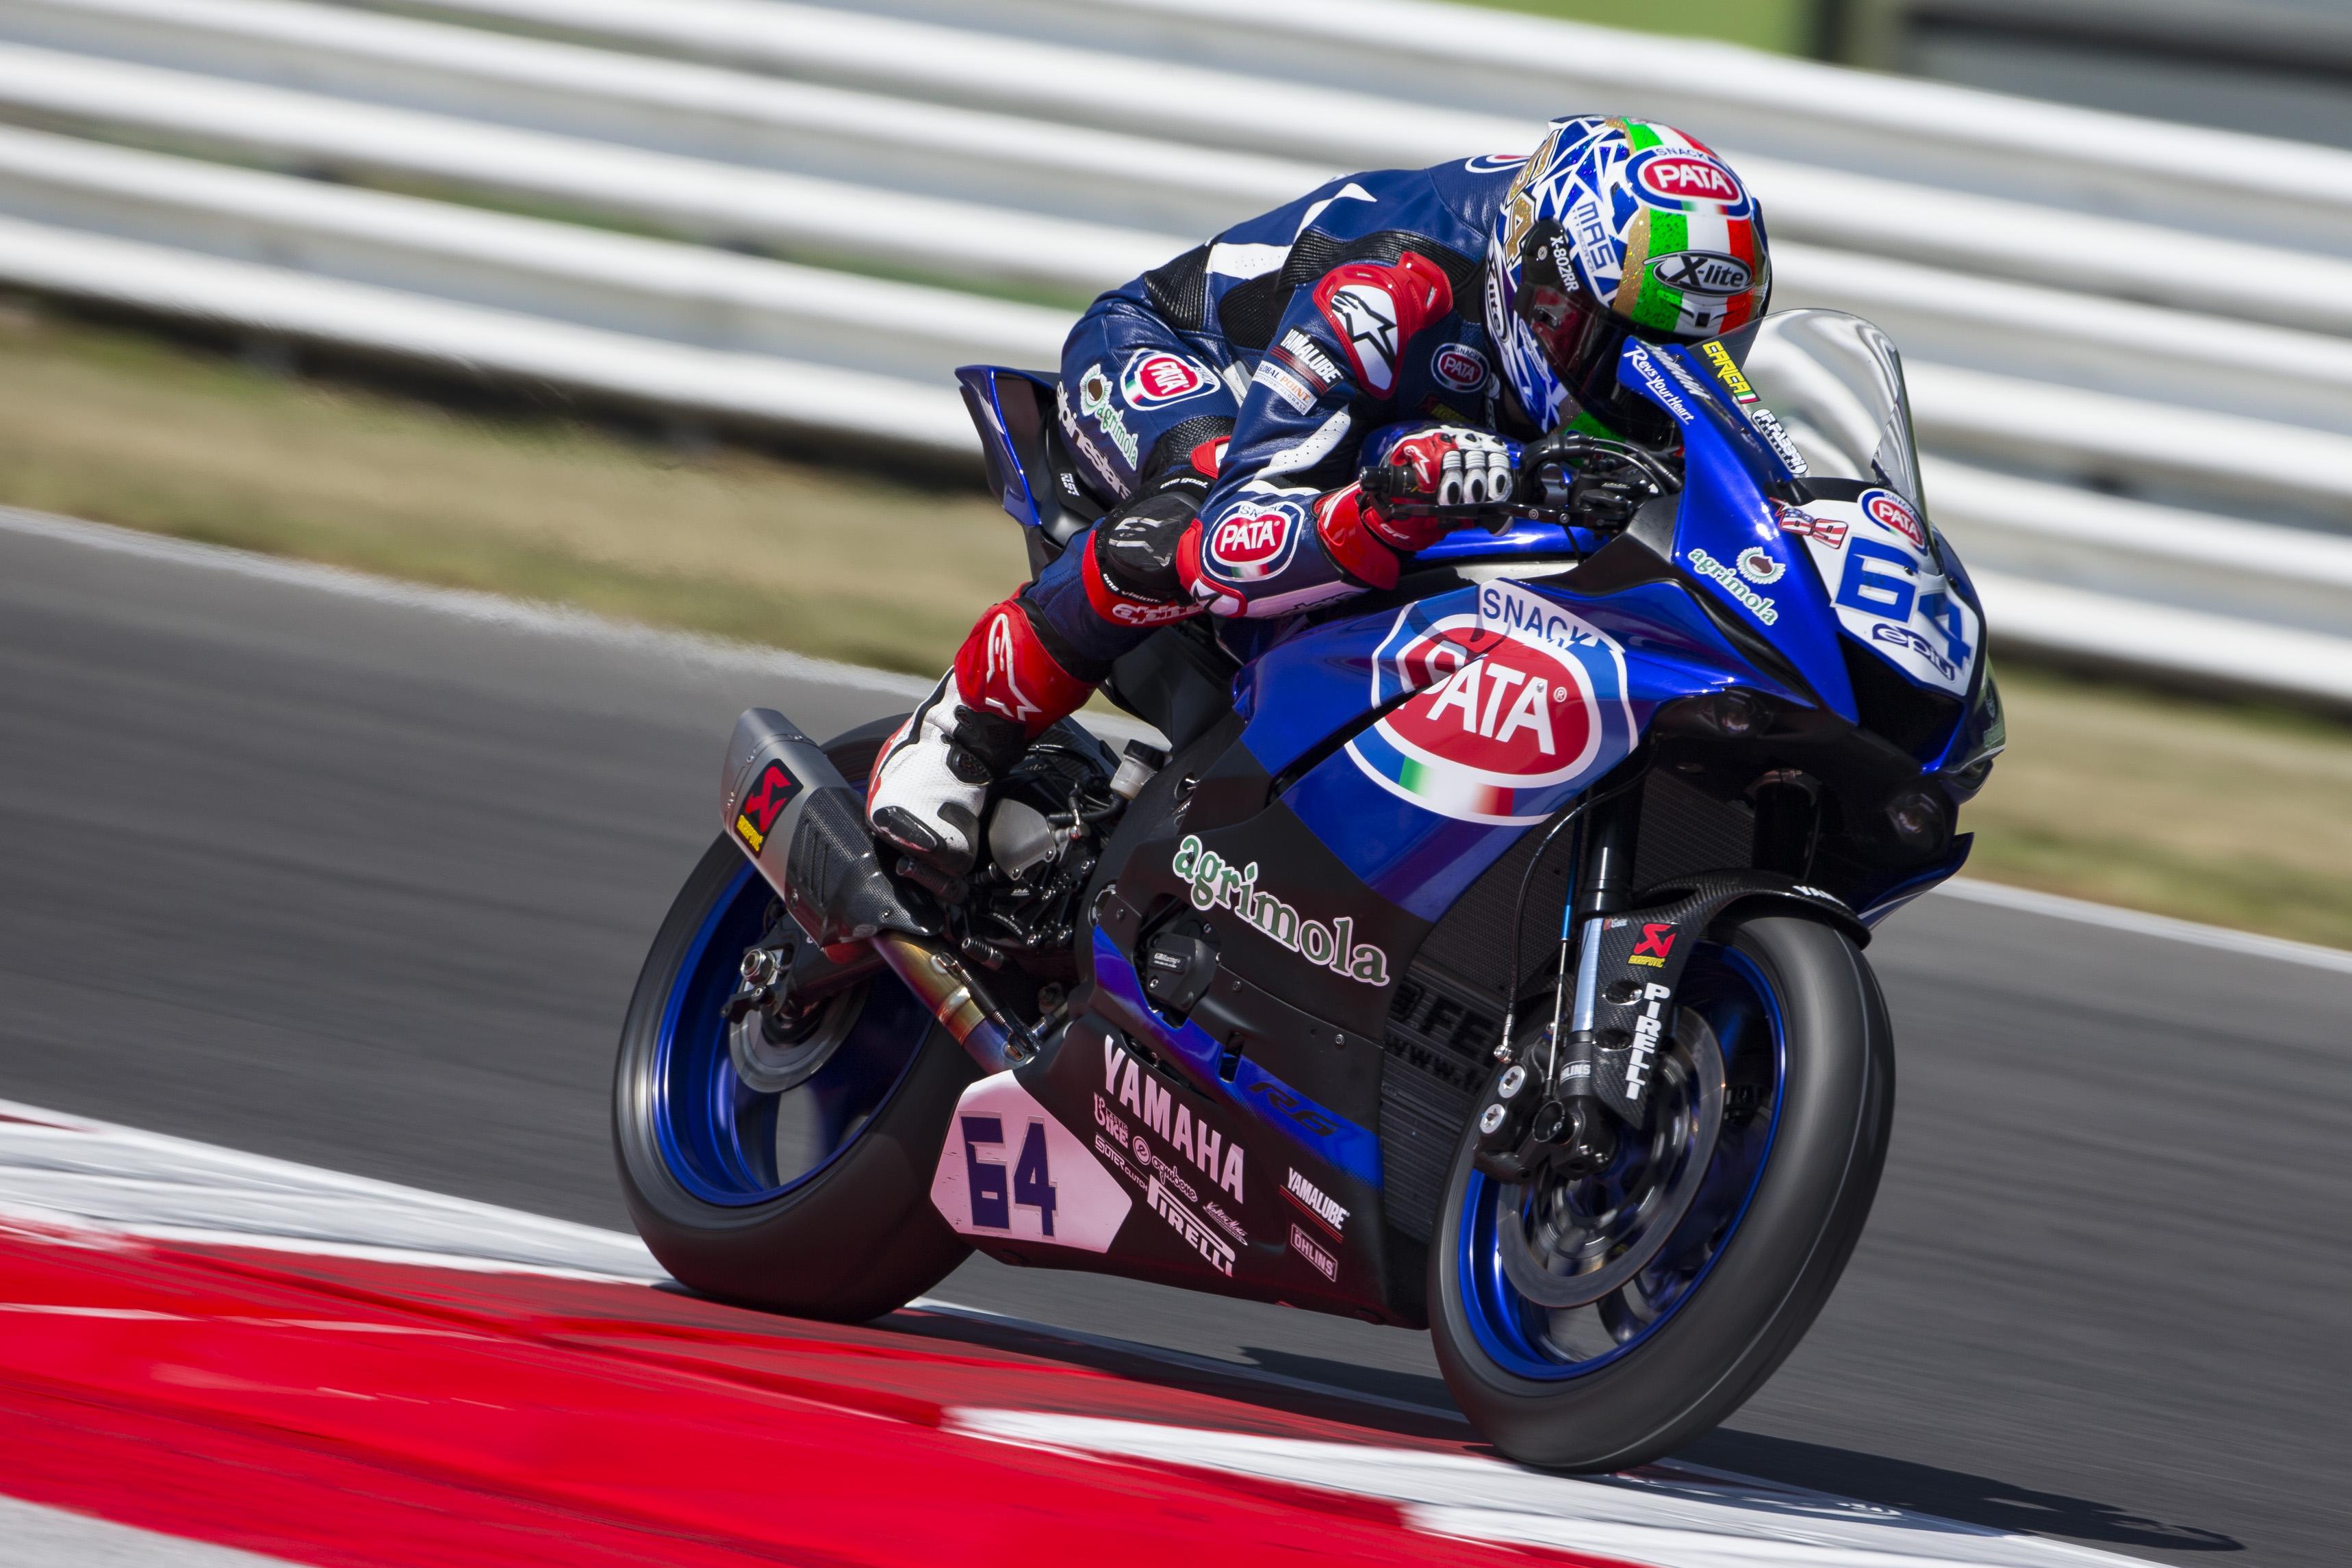 GRT Yamaha Turn up the Heat on Friday at Misano - Yamaha Racing